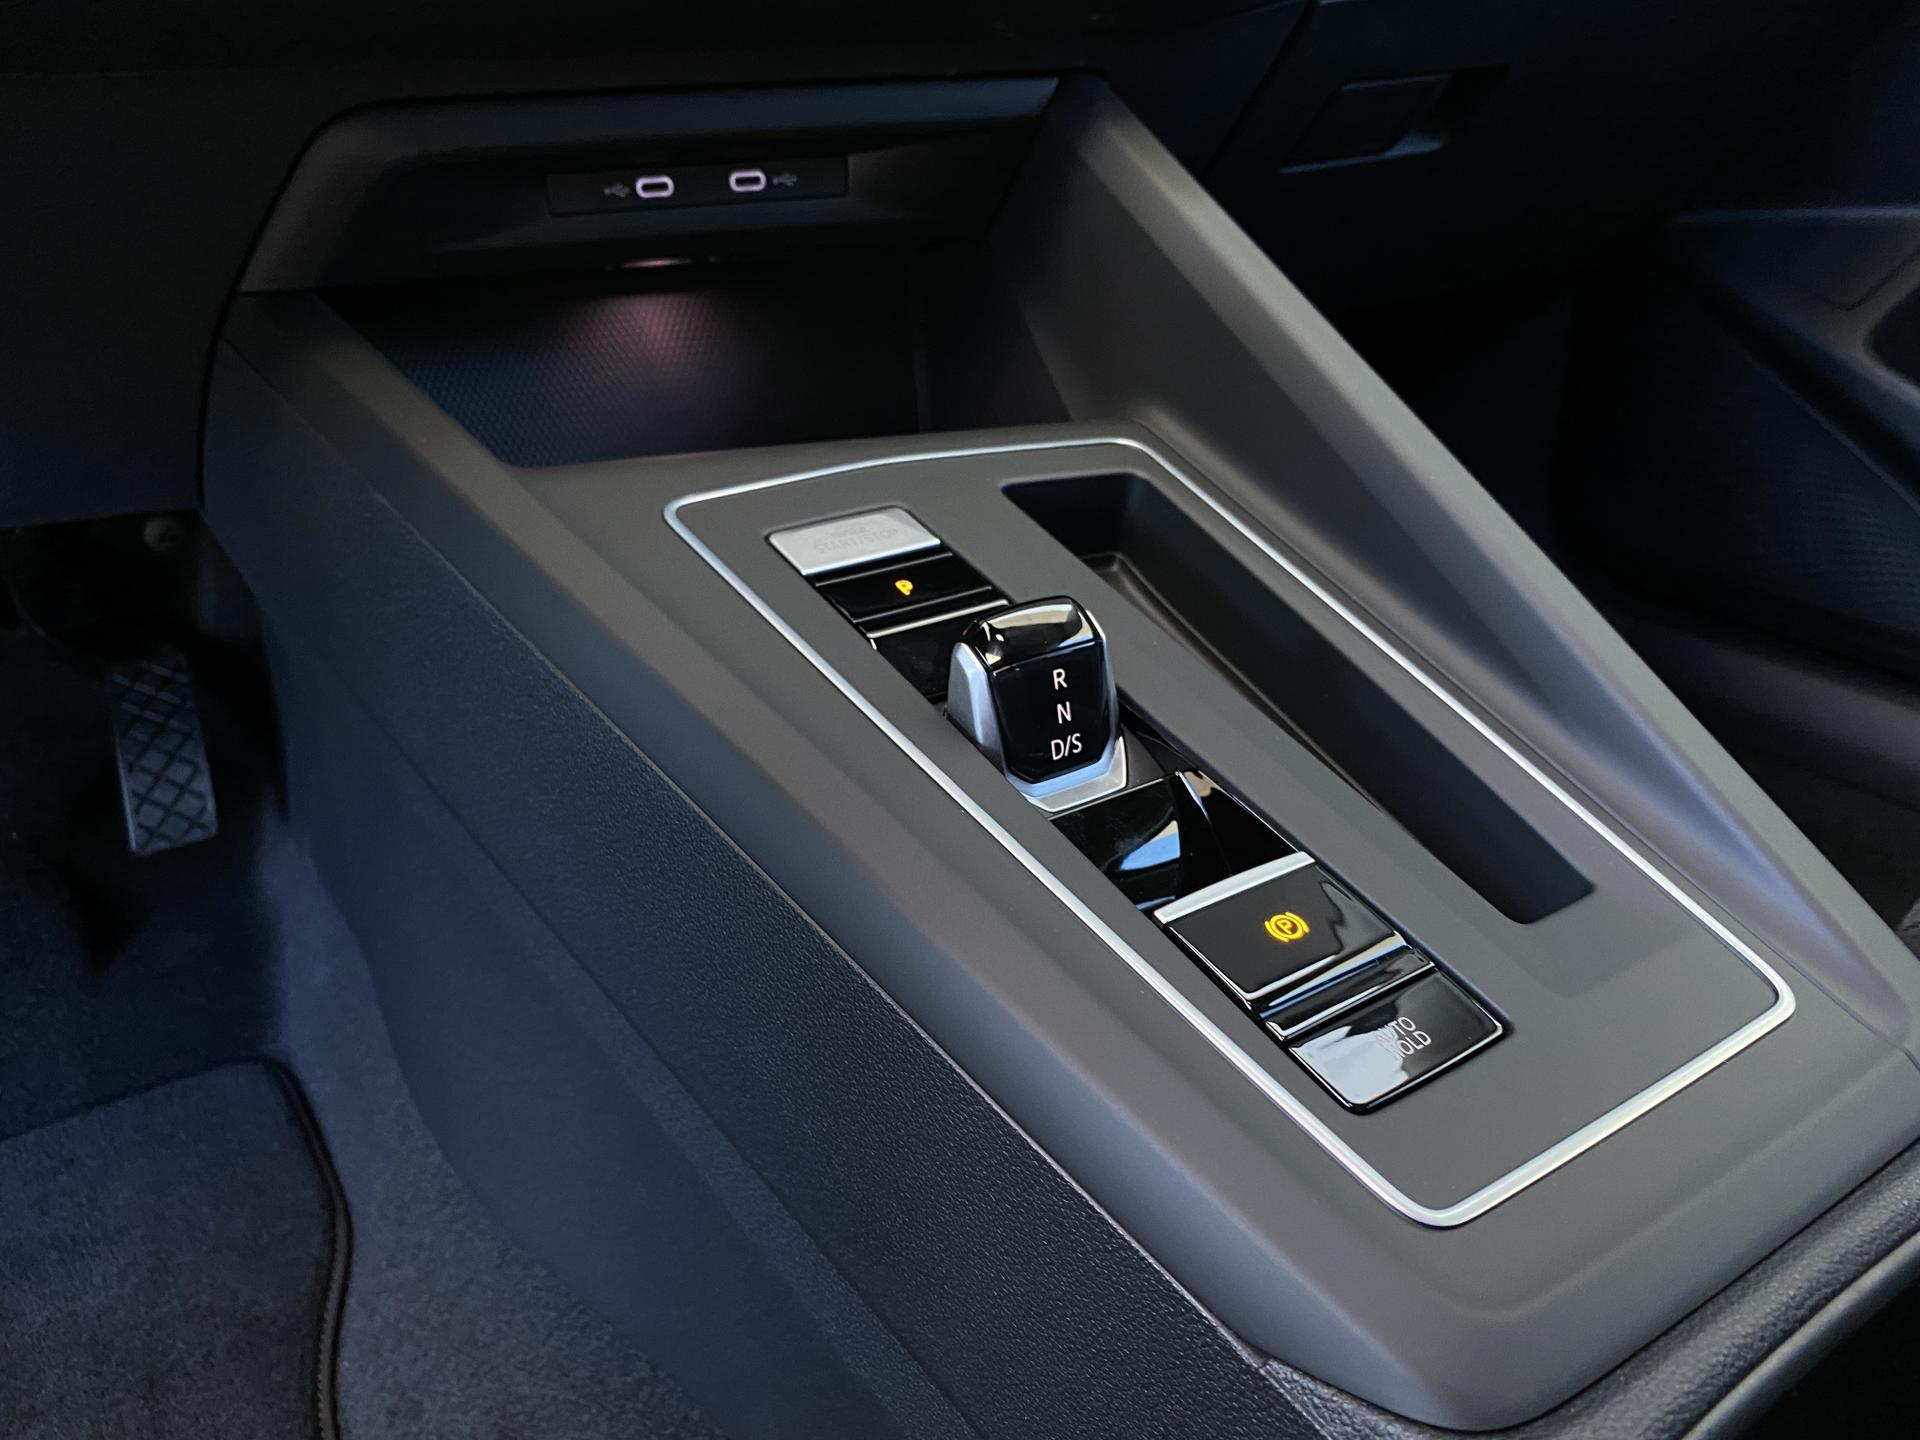 VW Golf Variant Automatikgetriebe